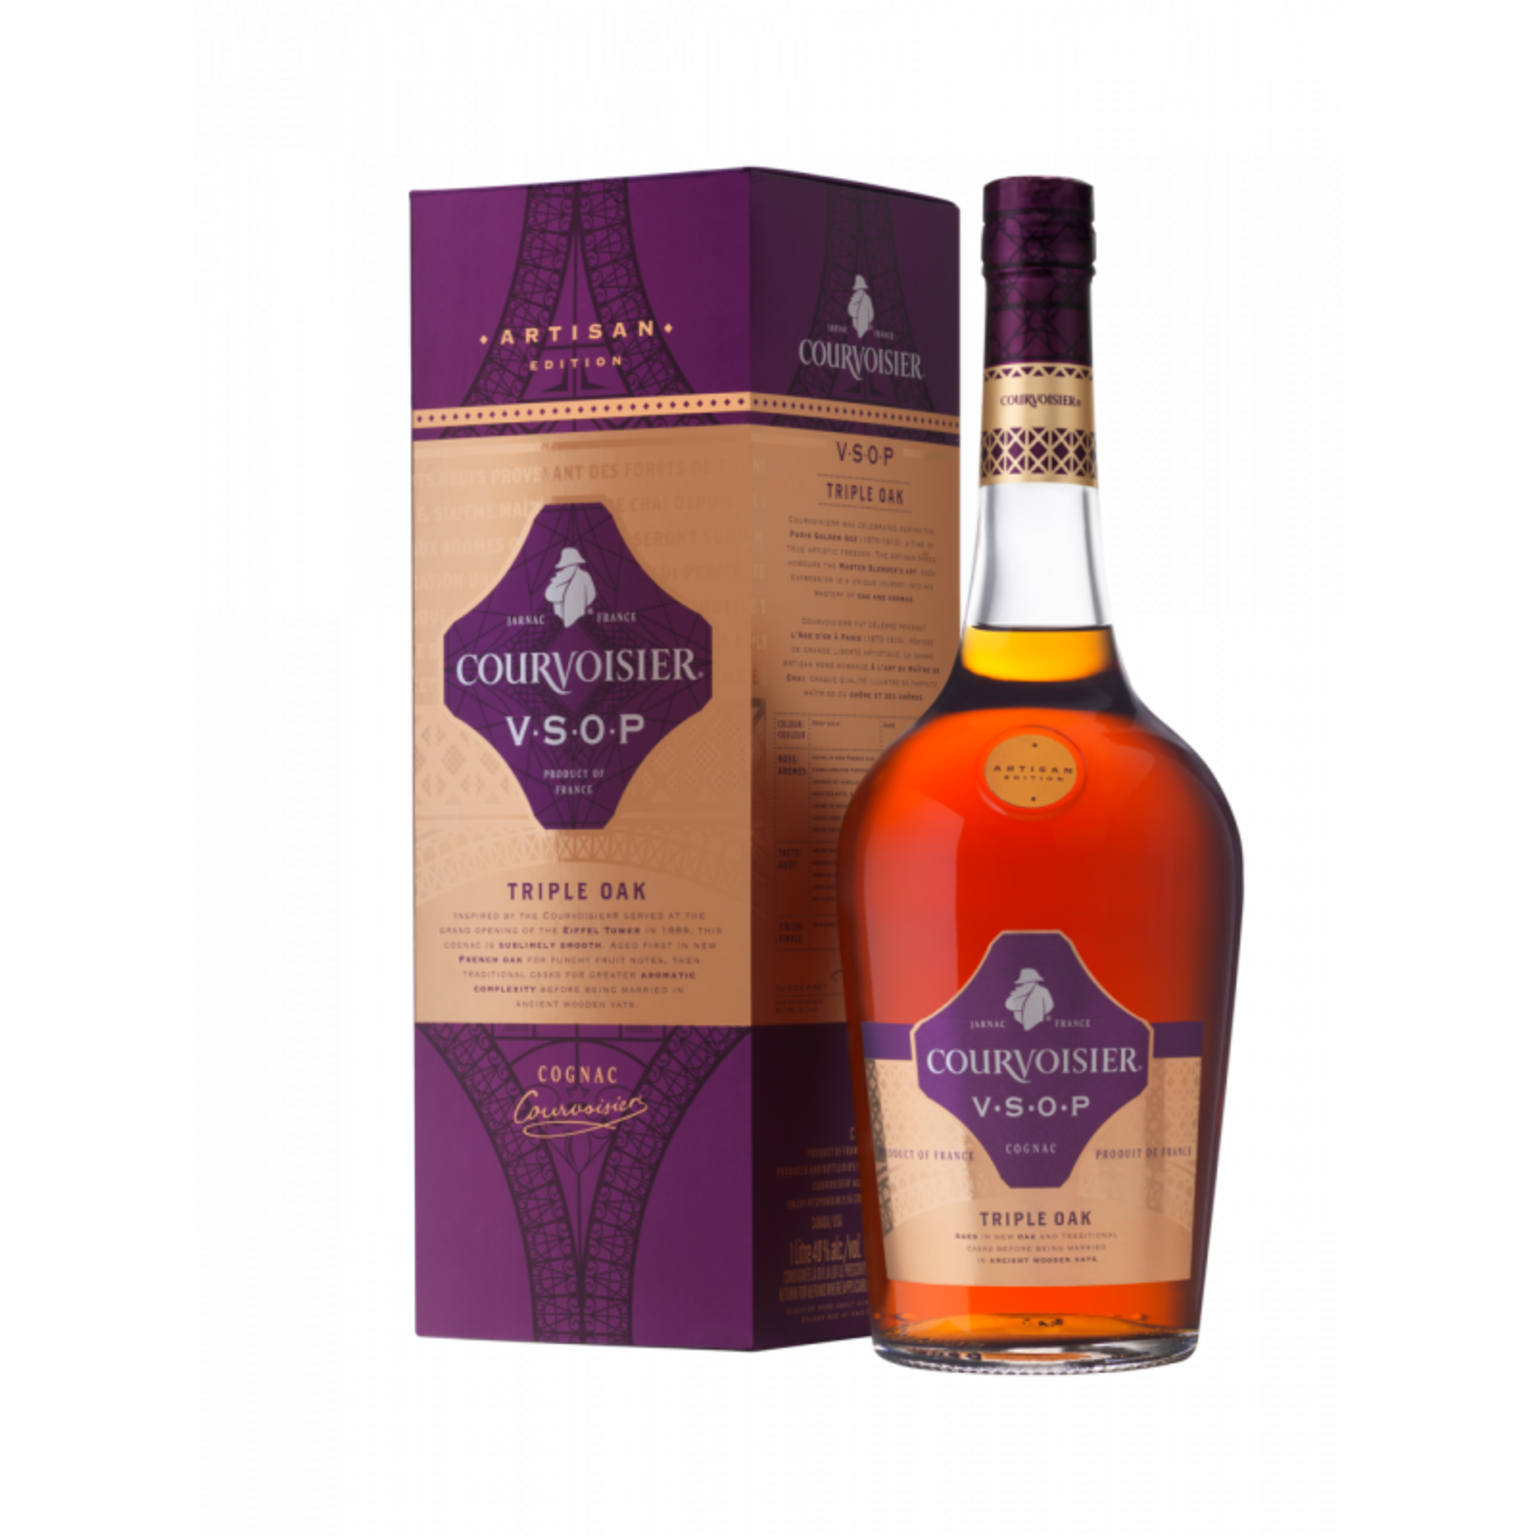 Courvoisier Artisan VSOP Triple Oak 40% 1L Giftpack